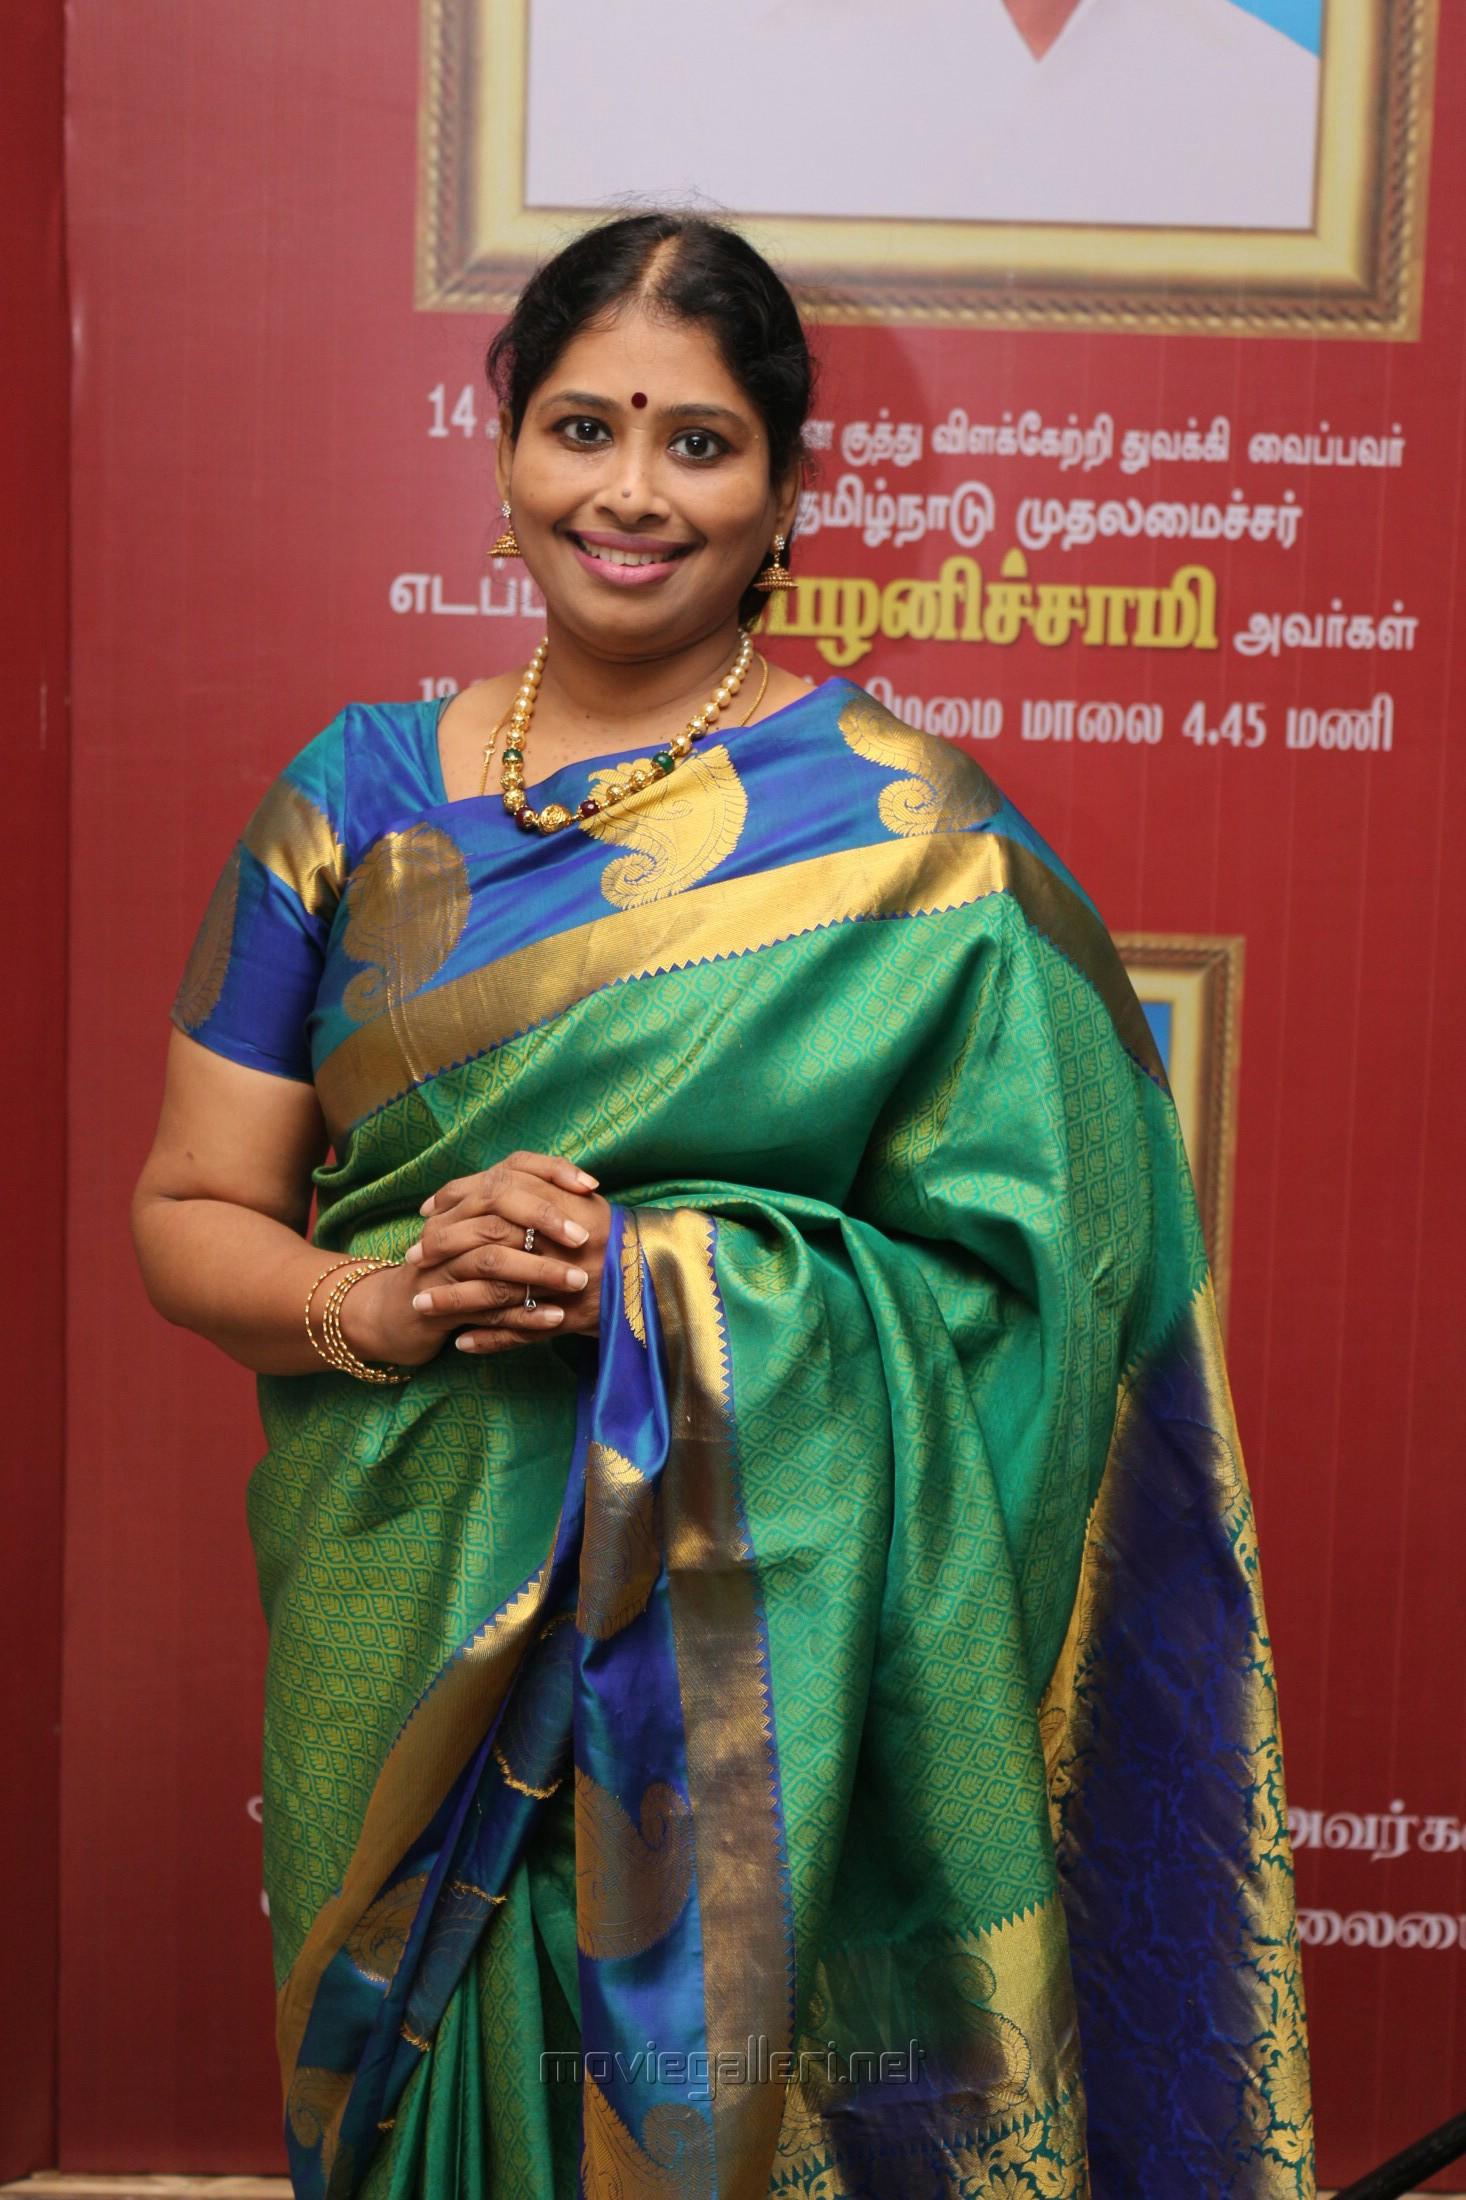 Nithyasree Mahadevan @ Chennaiyil Thiruvaiyaru 2018 Season 14 Press Meet Stills